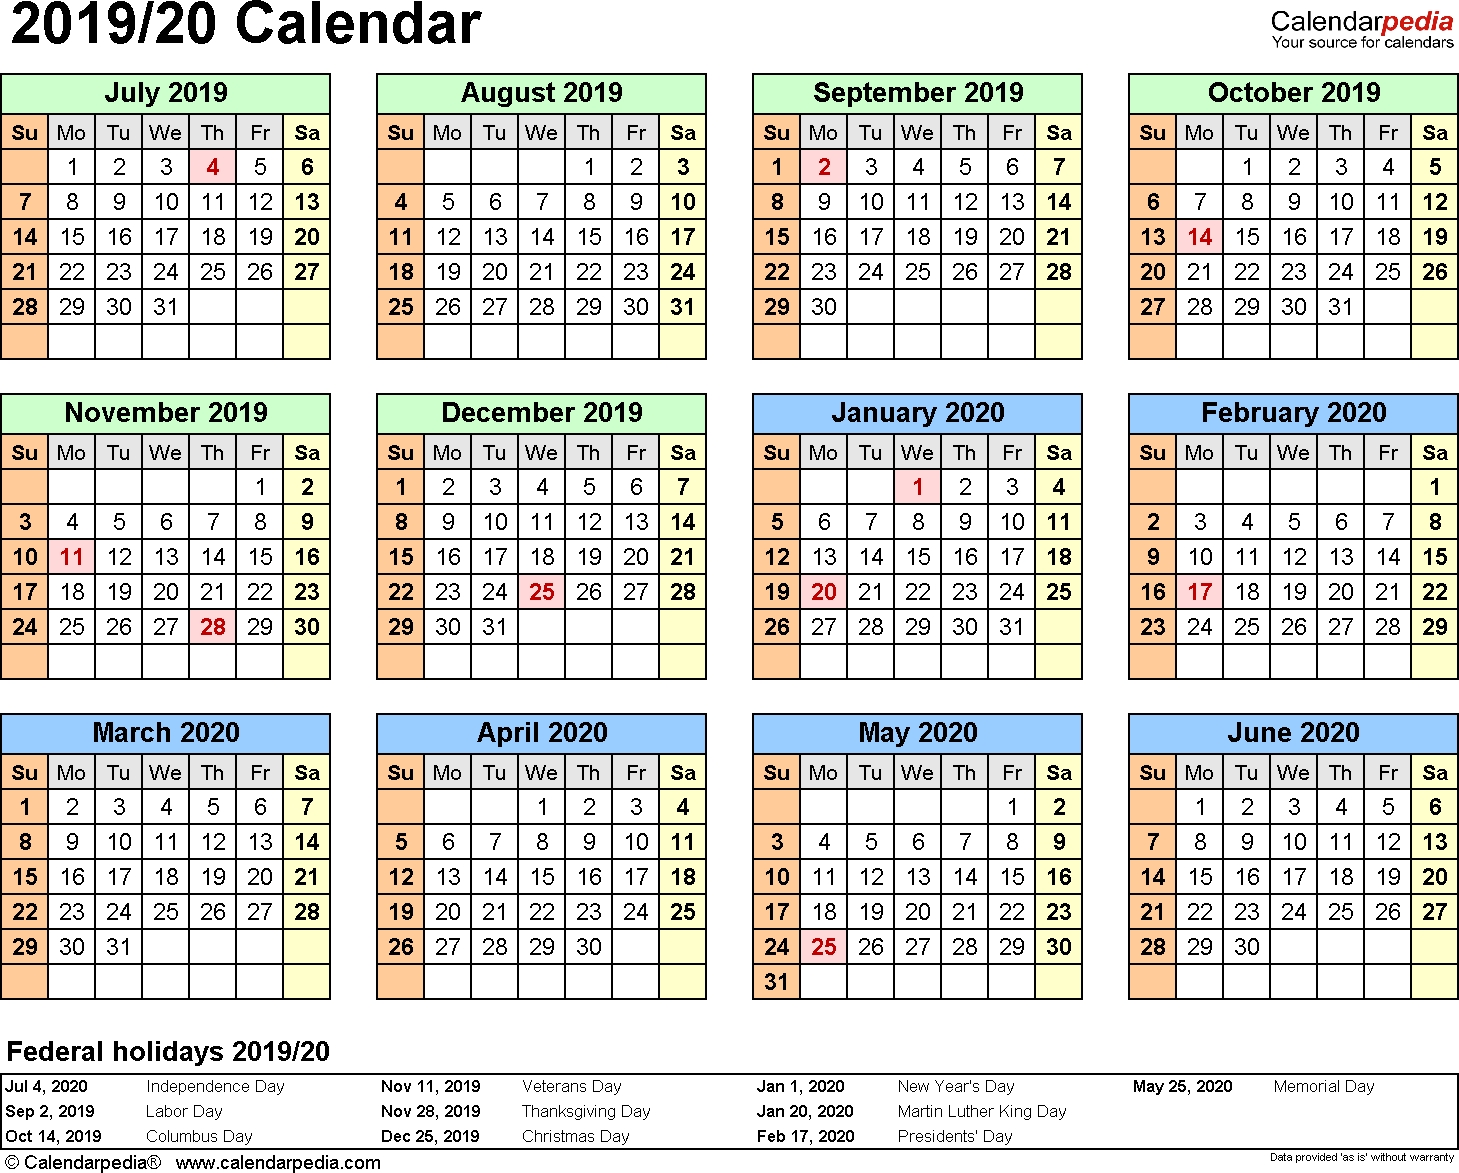 Split Year Calendar 2019/20 (July To June) - Pdf Templates  2020 20 Australian Financial Year Calendar